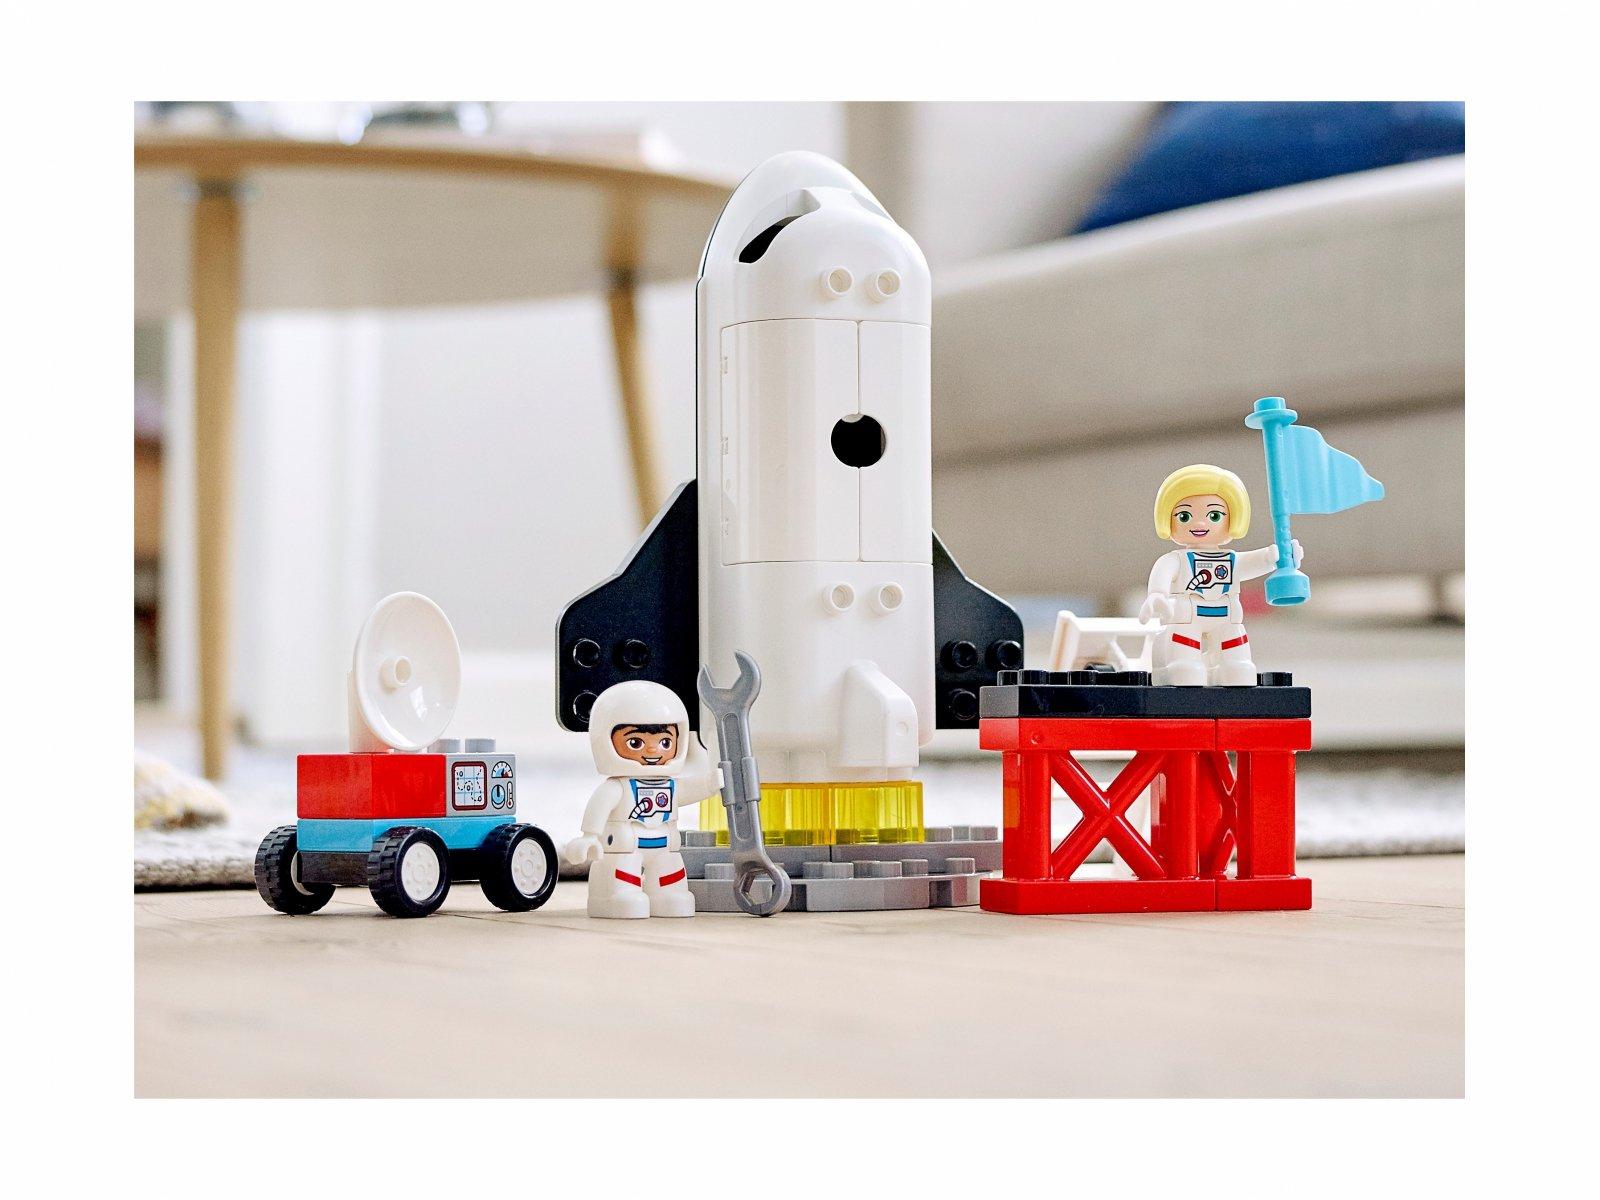 LEGO Duplo 10944 Lot promem kosmicznym